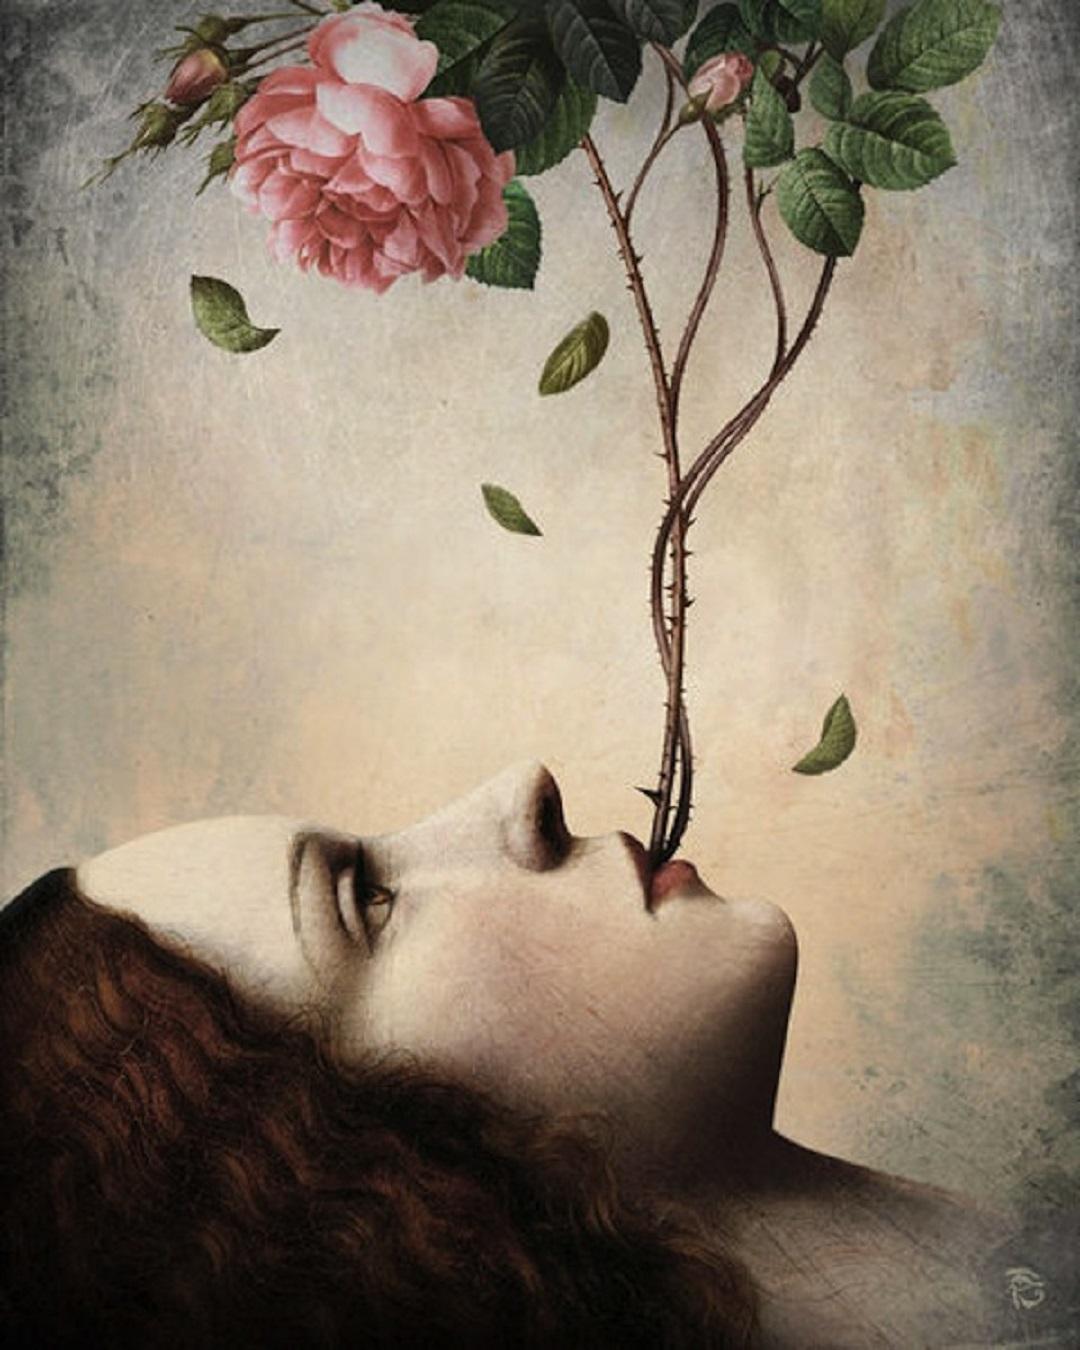 christian-schloe-woman-talks-rose-bush